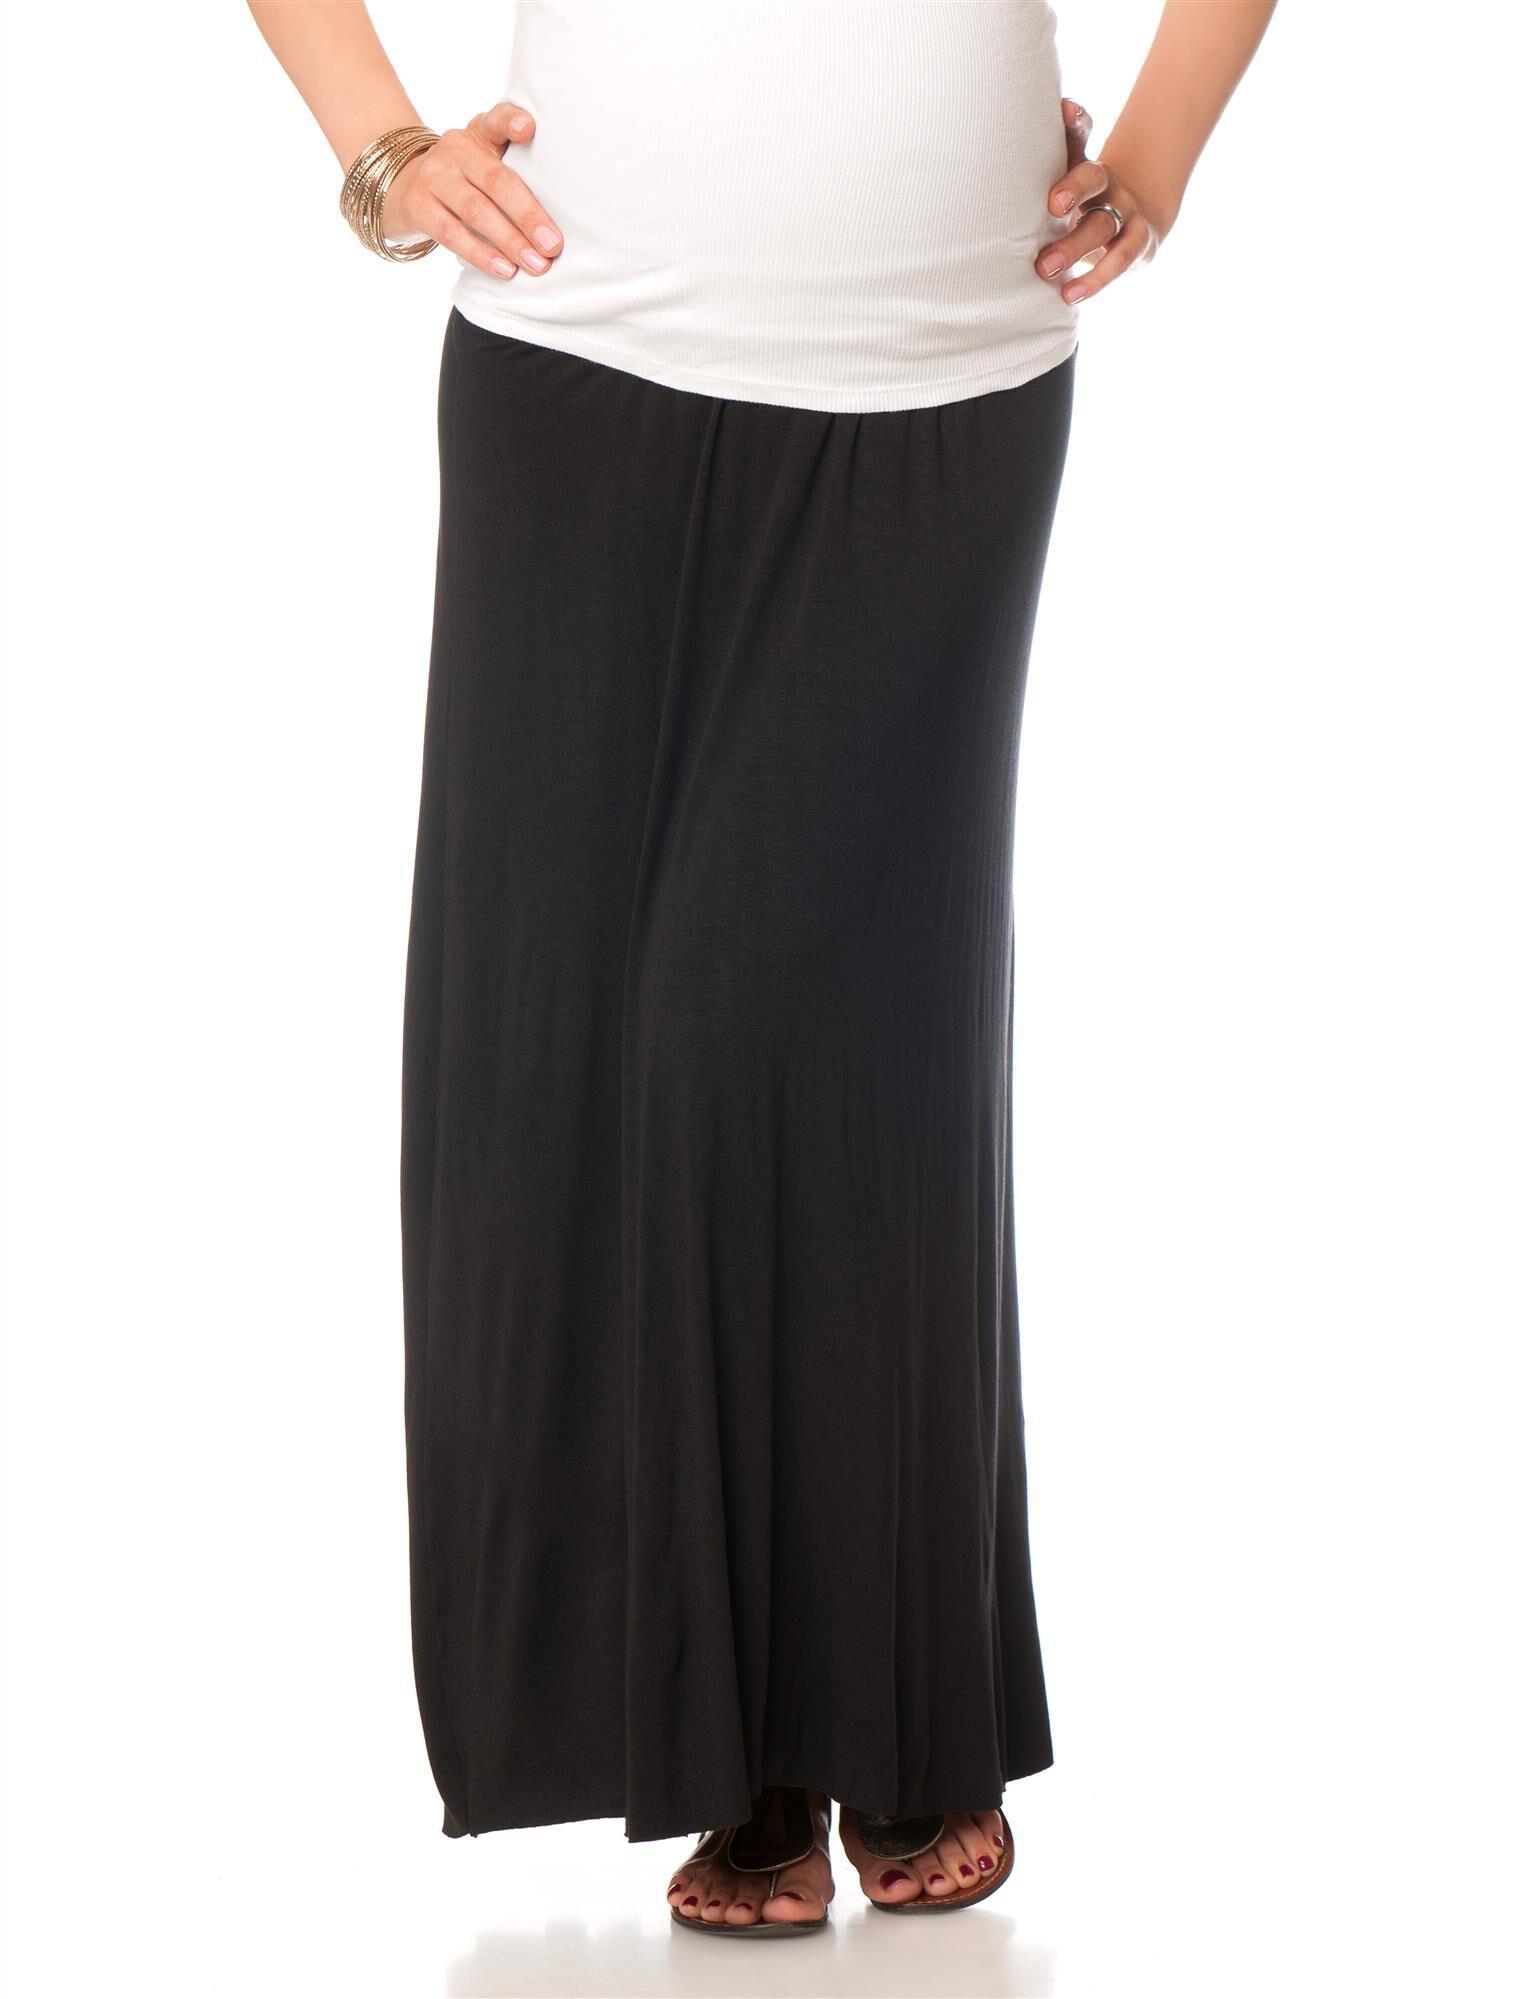 Fold Over Belly Lightweight Maternity Skirt